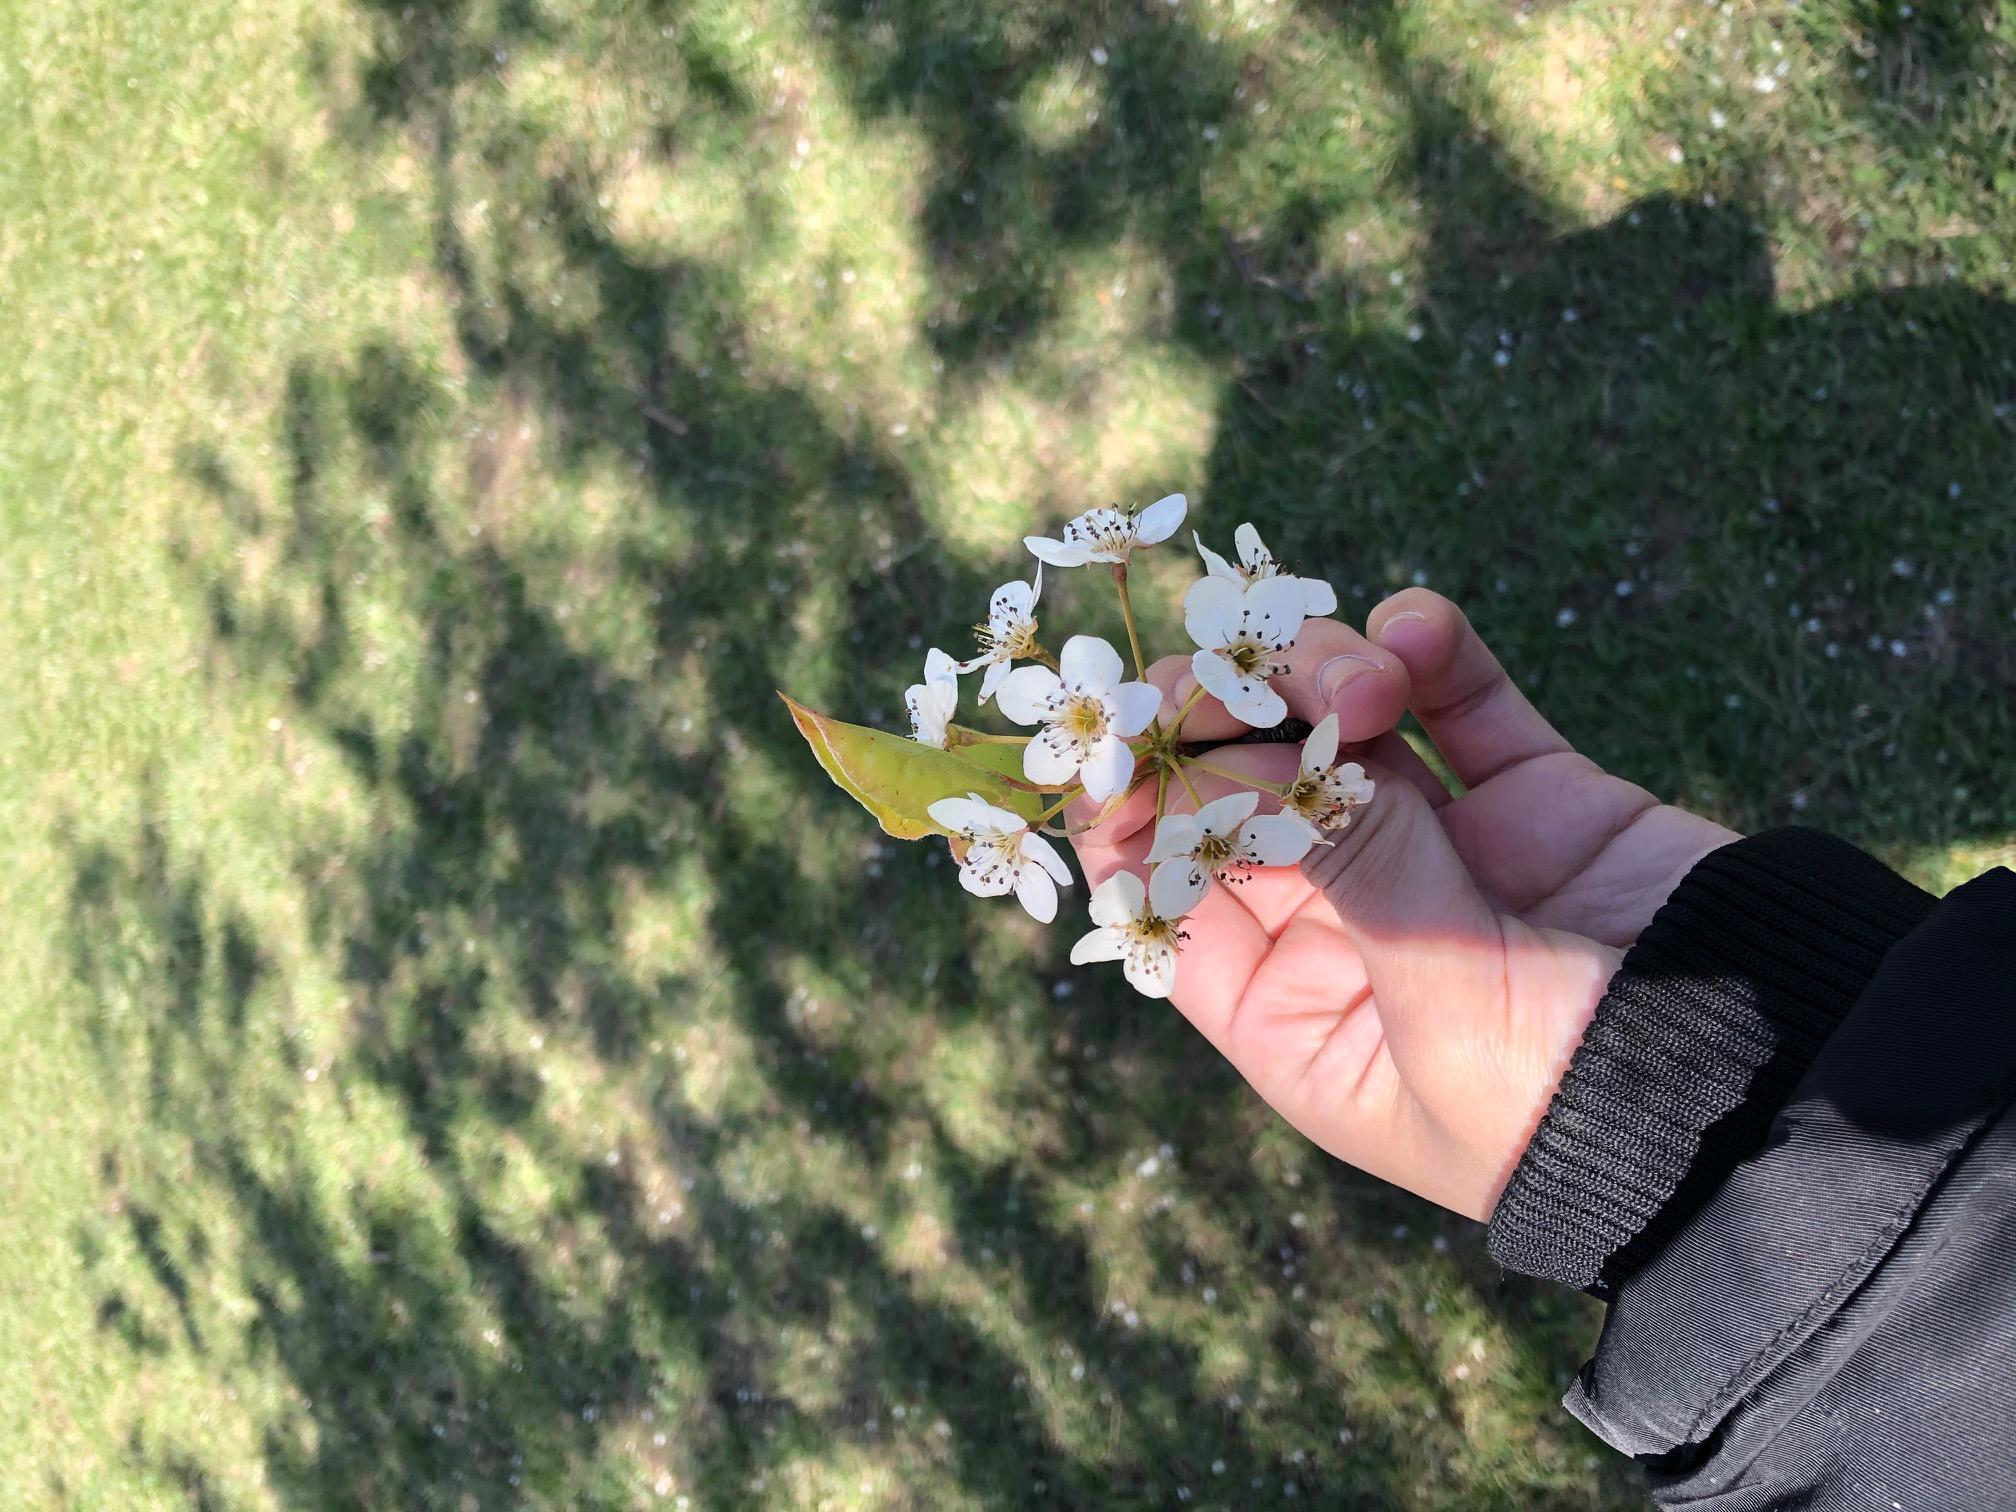 flower with shadow.JPG